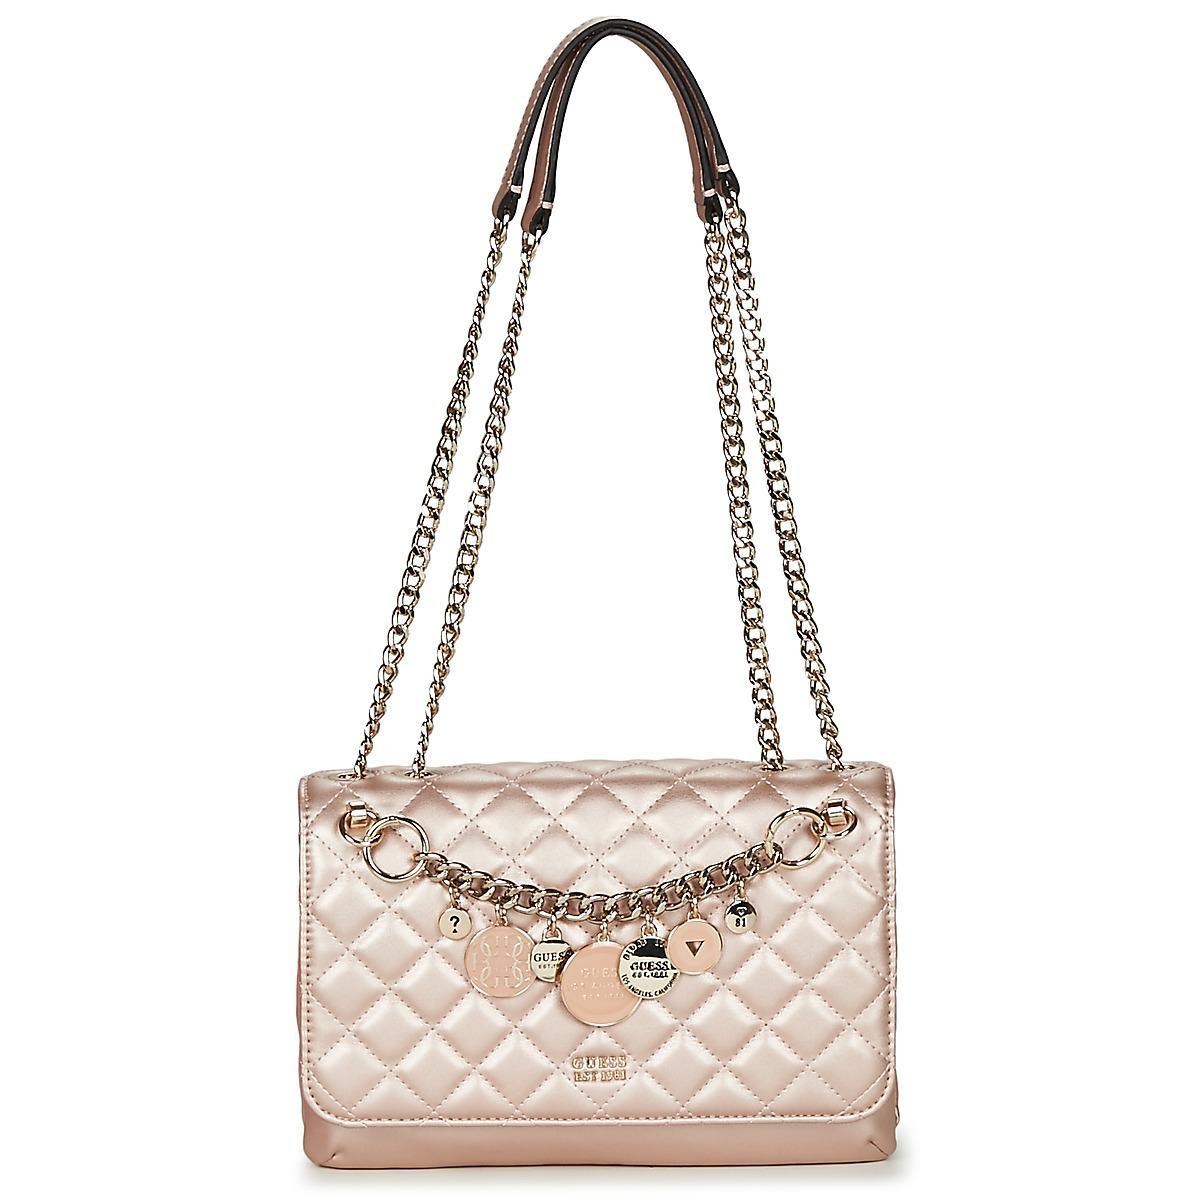 34f97ba9d9 Guess - Victoria Convertible Crossbody Flap Women s Shoulder Bag In Pink  for Men - Lyst. View fullscreen